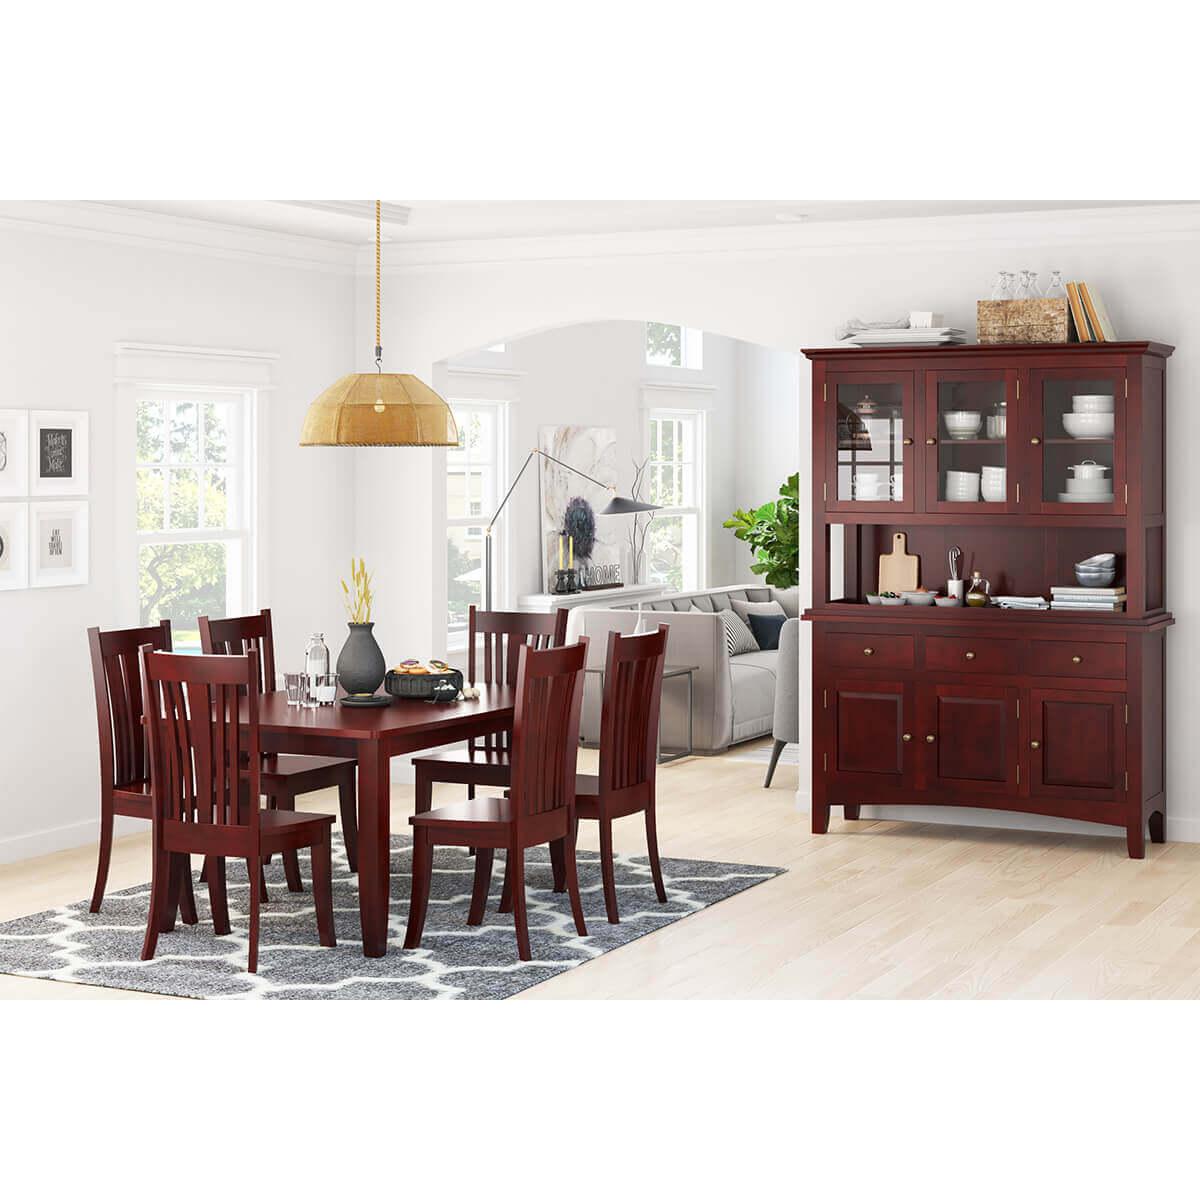 barryton solid mahogany wood 8 piece dining room set. Black Bedroom Furniture Sets. Home Design Ideas